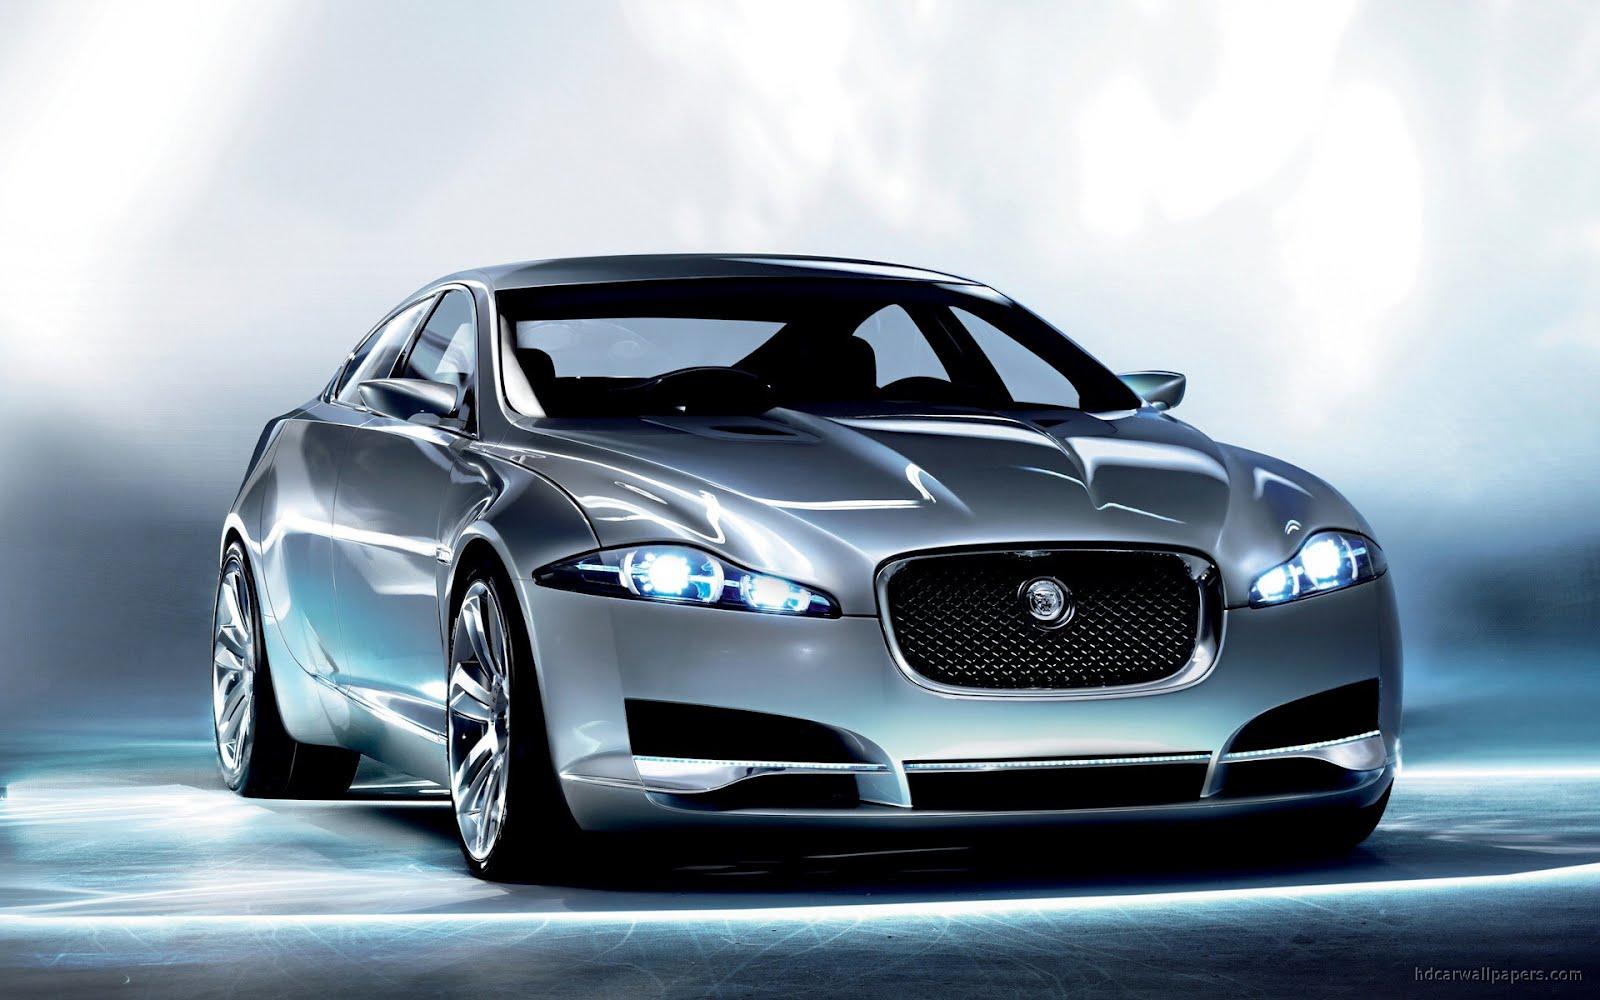 http://3.bp.blogspot.com/-8AIfuQqowv4/T7o1f-lDy1I/AAAAAAAAAIs/EvESBmFZX1I/s1600/jaguar-c-xf-concept-3-HD-Car-wallpapers.jpg